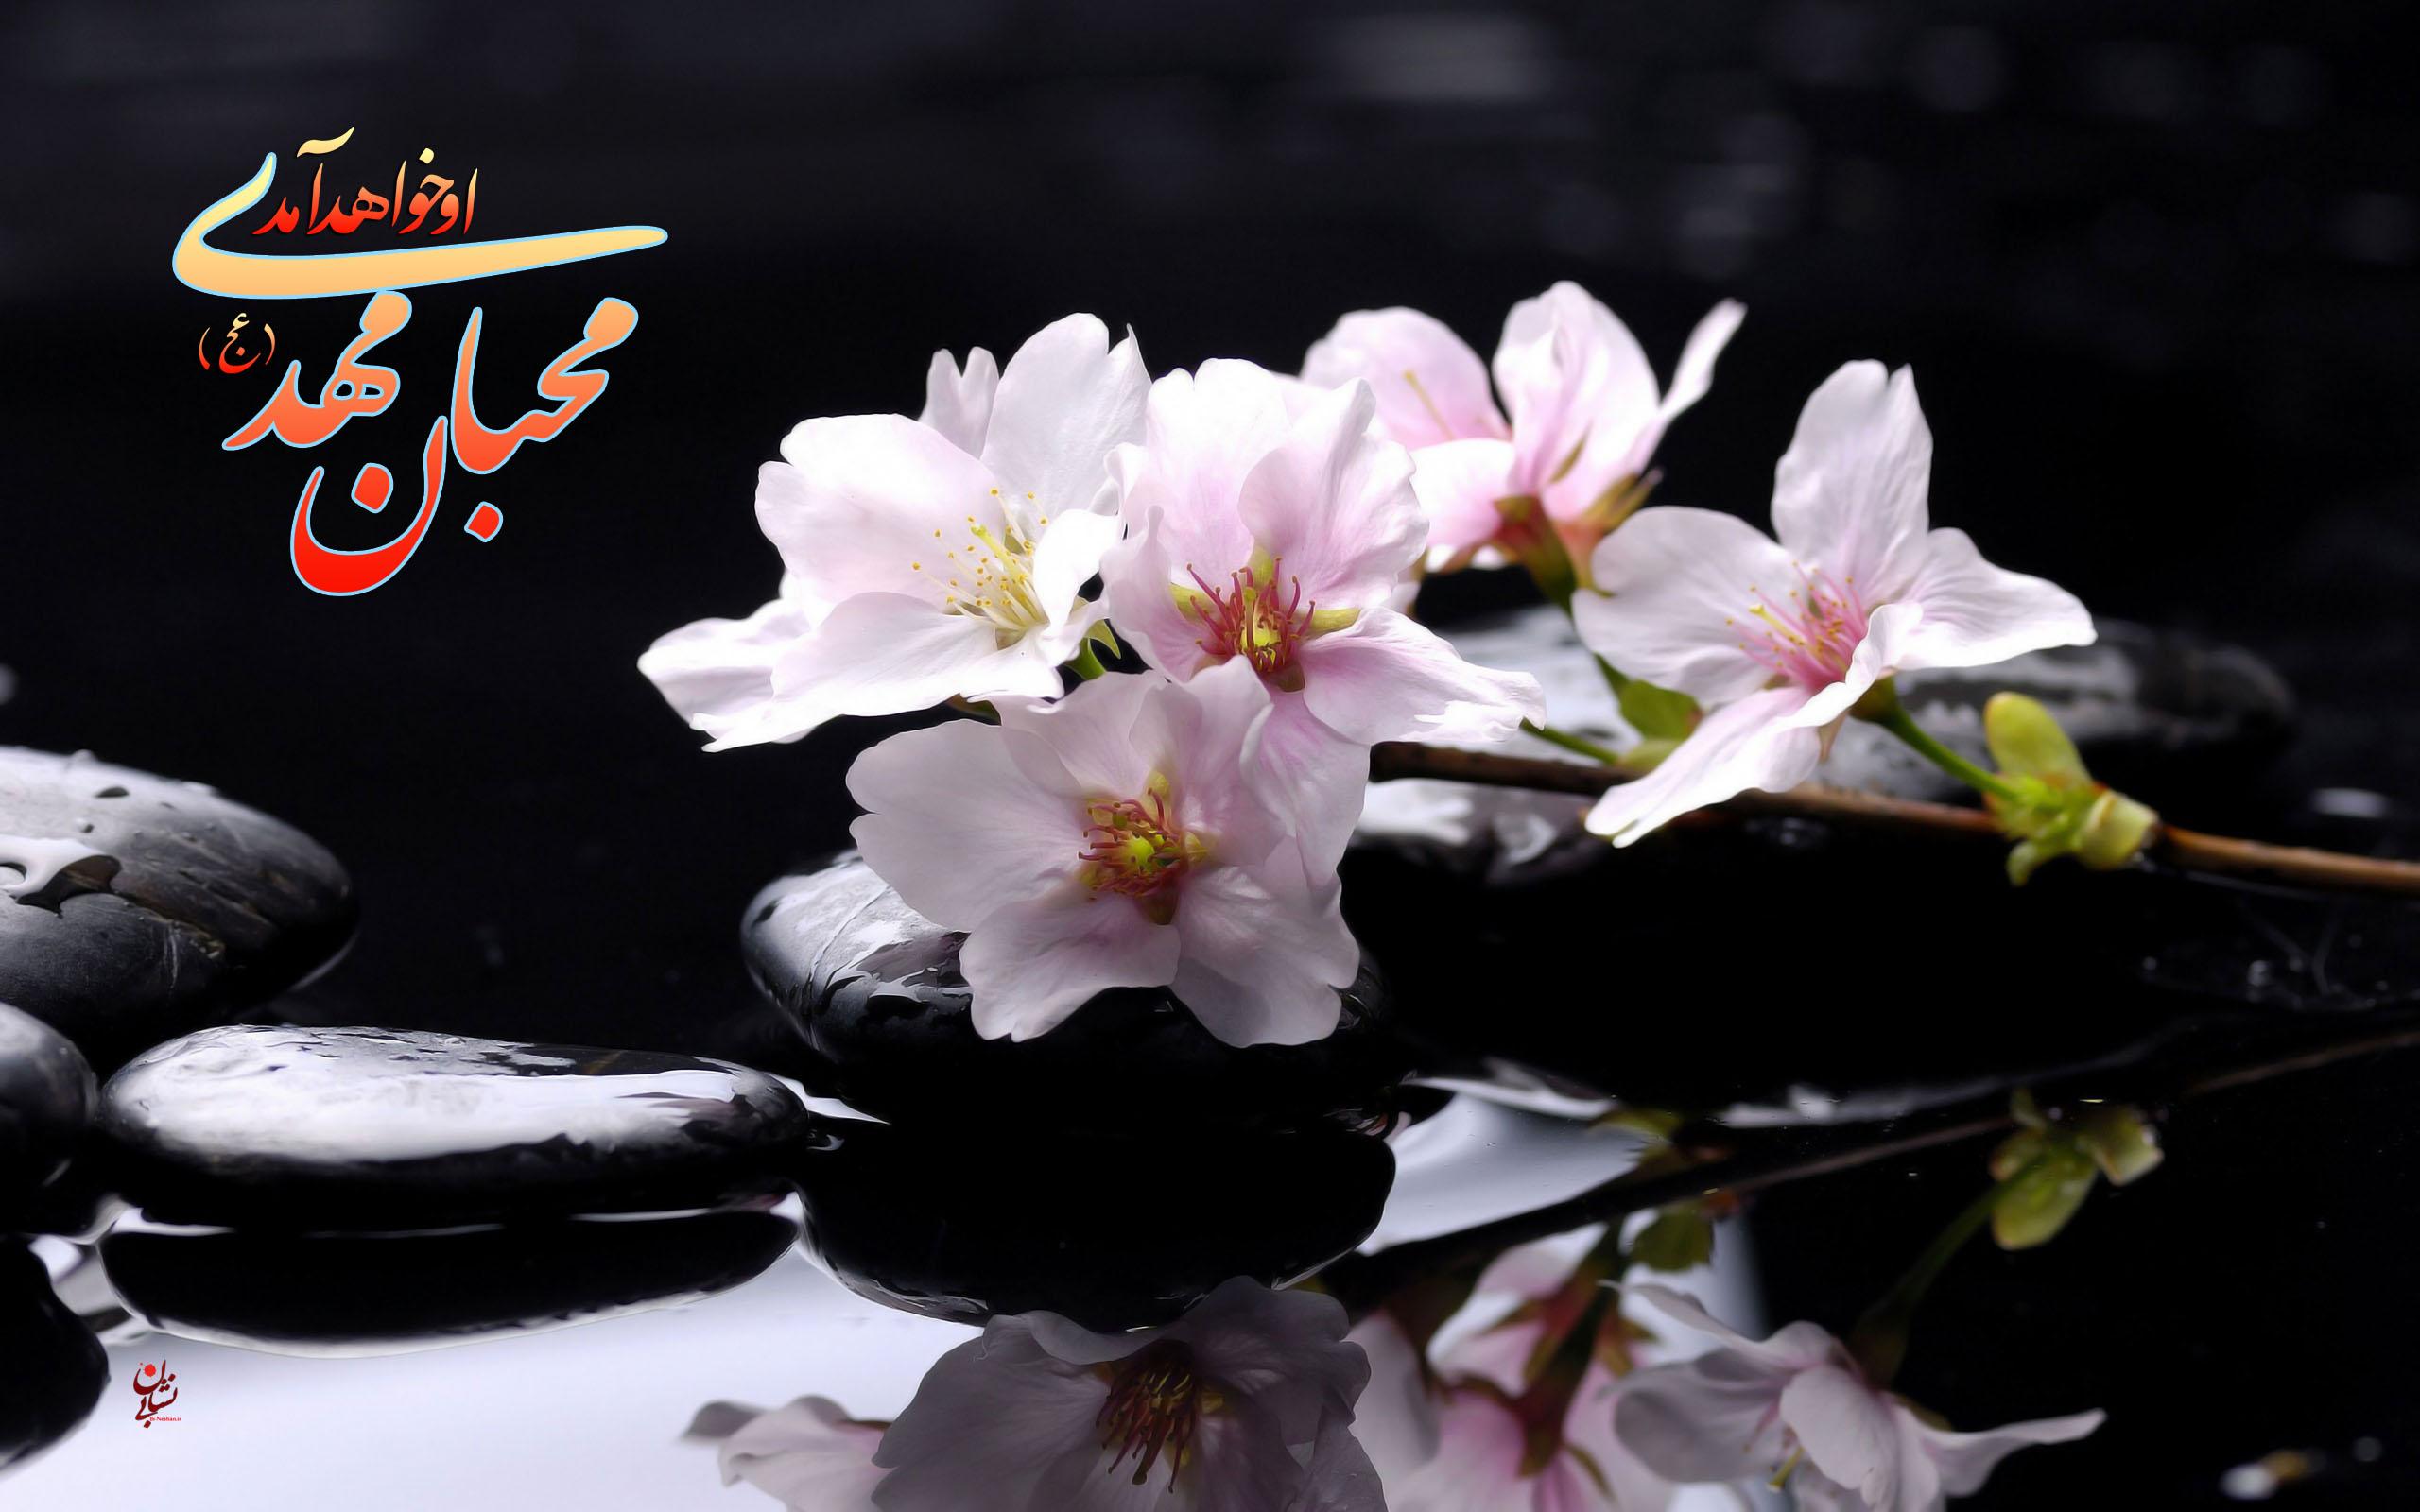 http://bi-neshan.ir/wp-content/uploads/2013/01/E.Mahdiaj-7.jpg